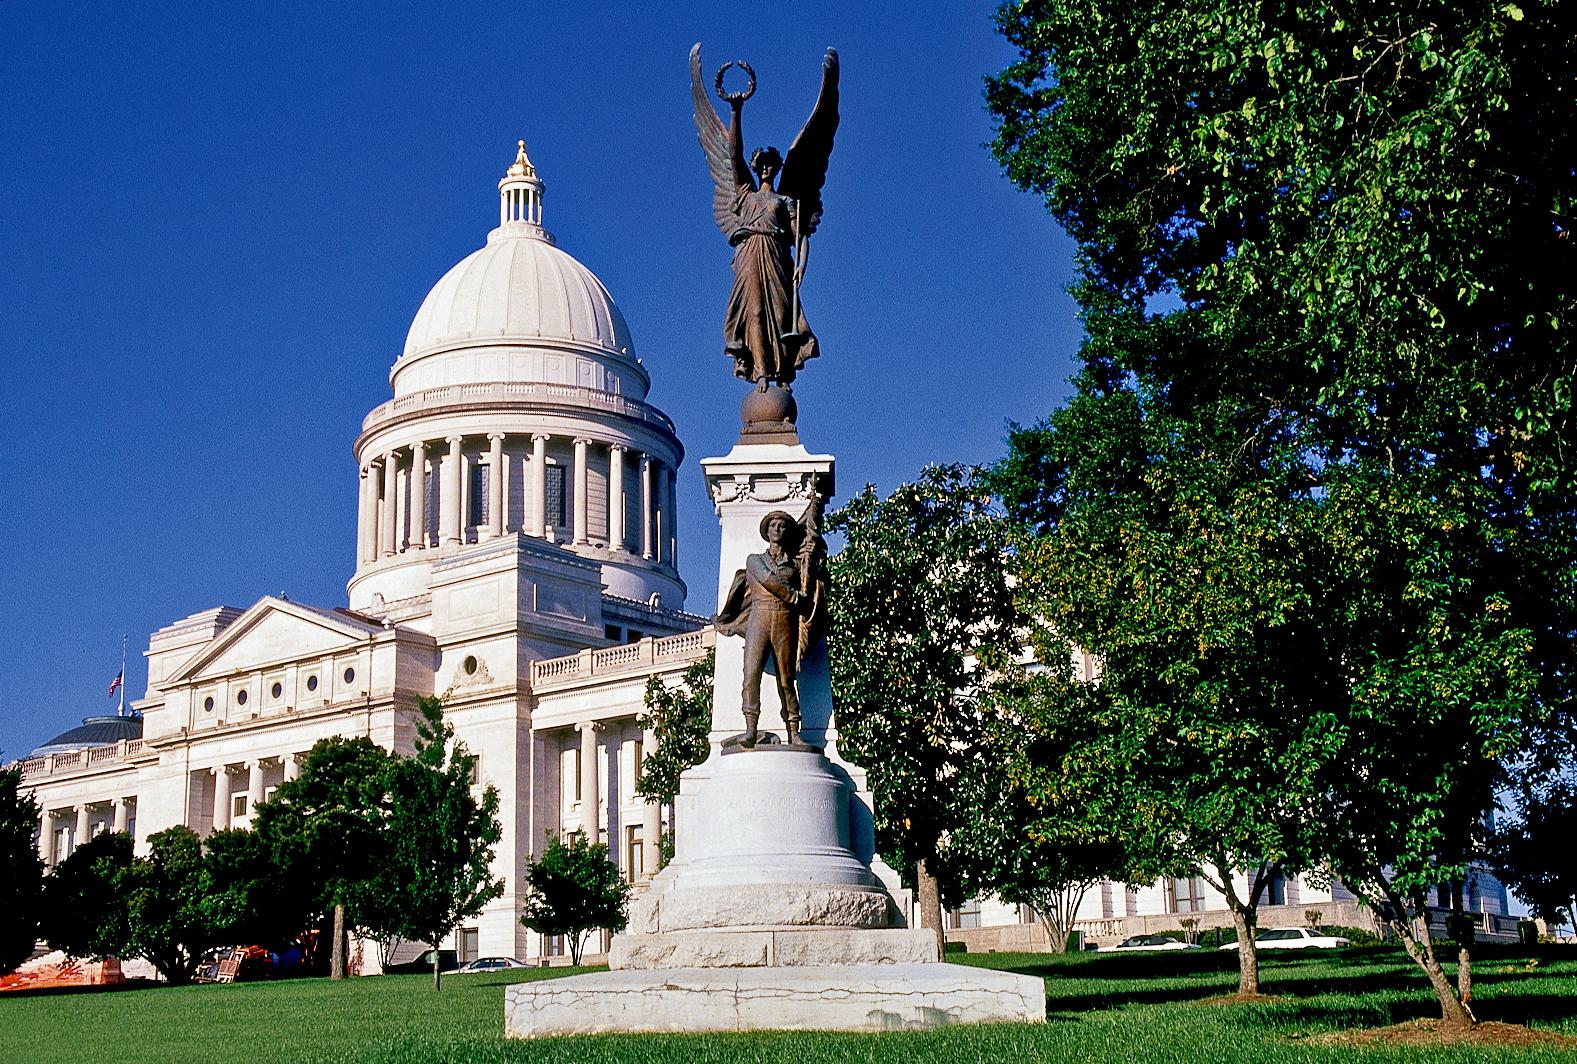 State Capitol building, Arkansas